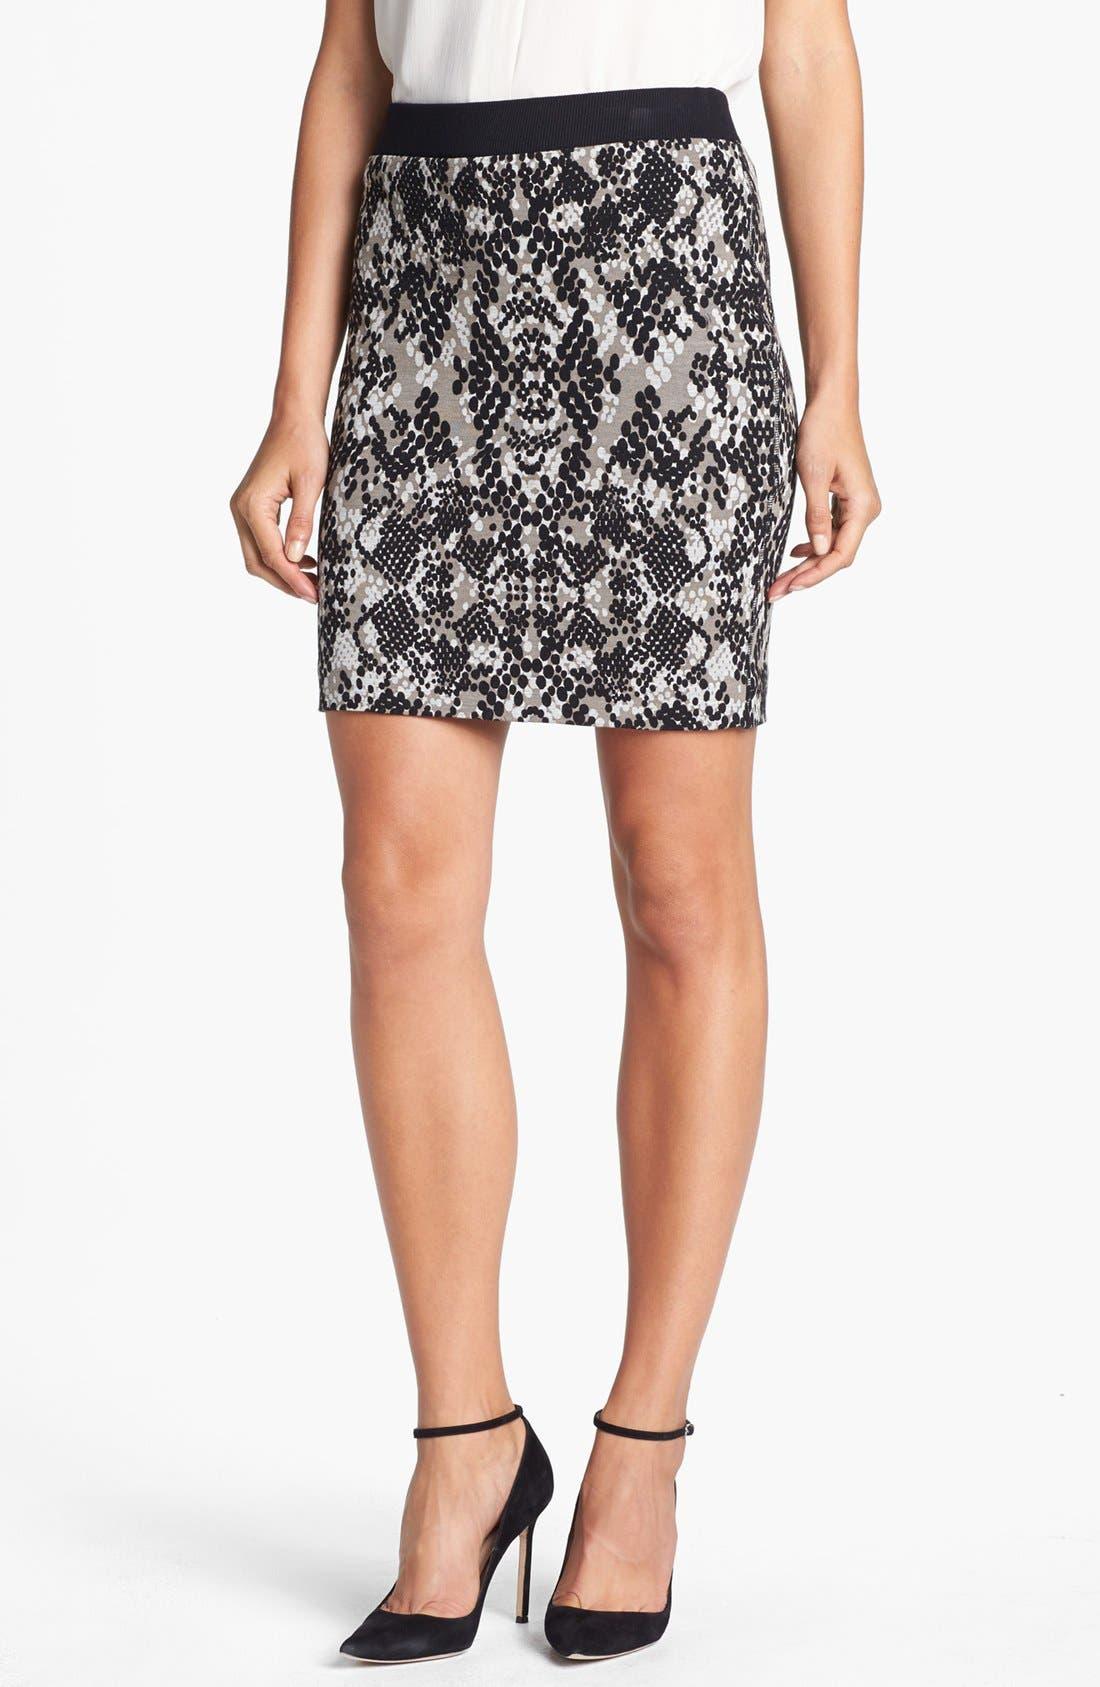 Alternate Image 1 Selected - Trina Turk 'Candra' Print Ponte Skirt